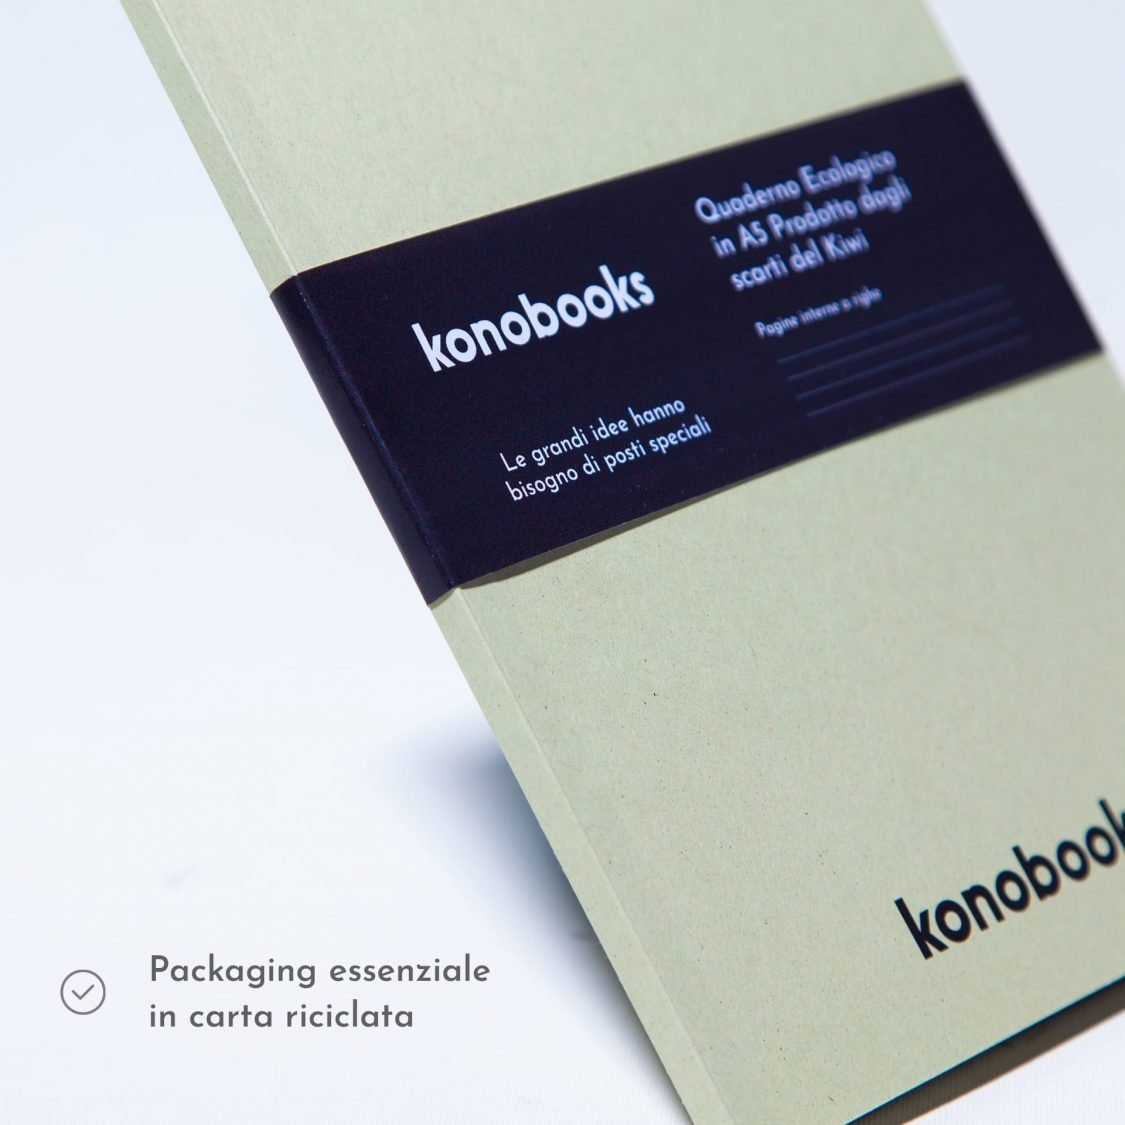 Quaderno plastic free in carta kiwi riciclata - Konobooks